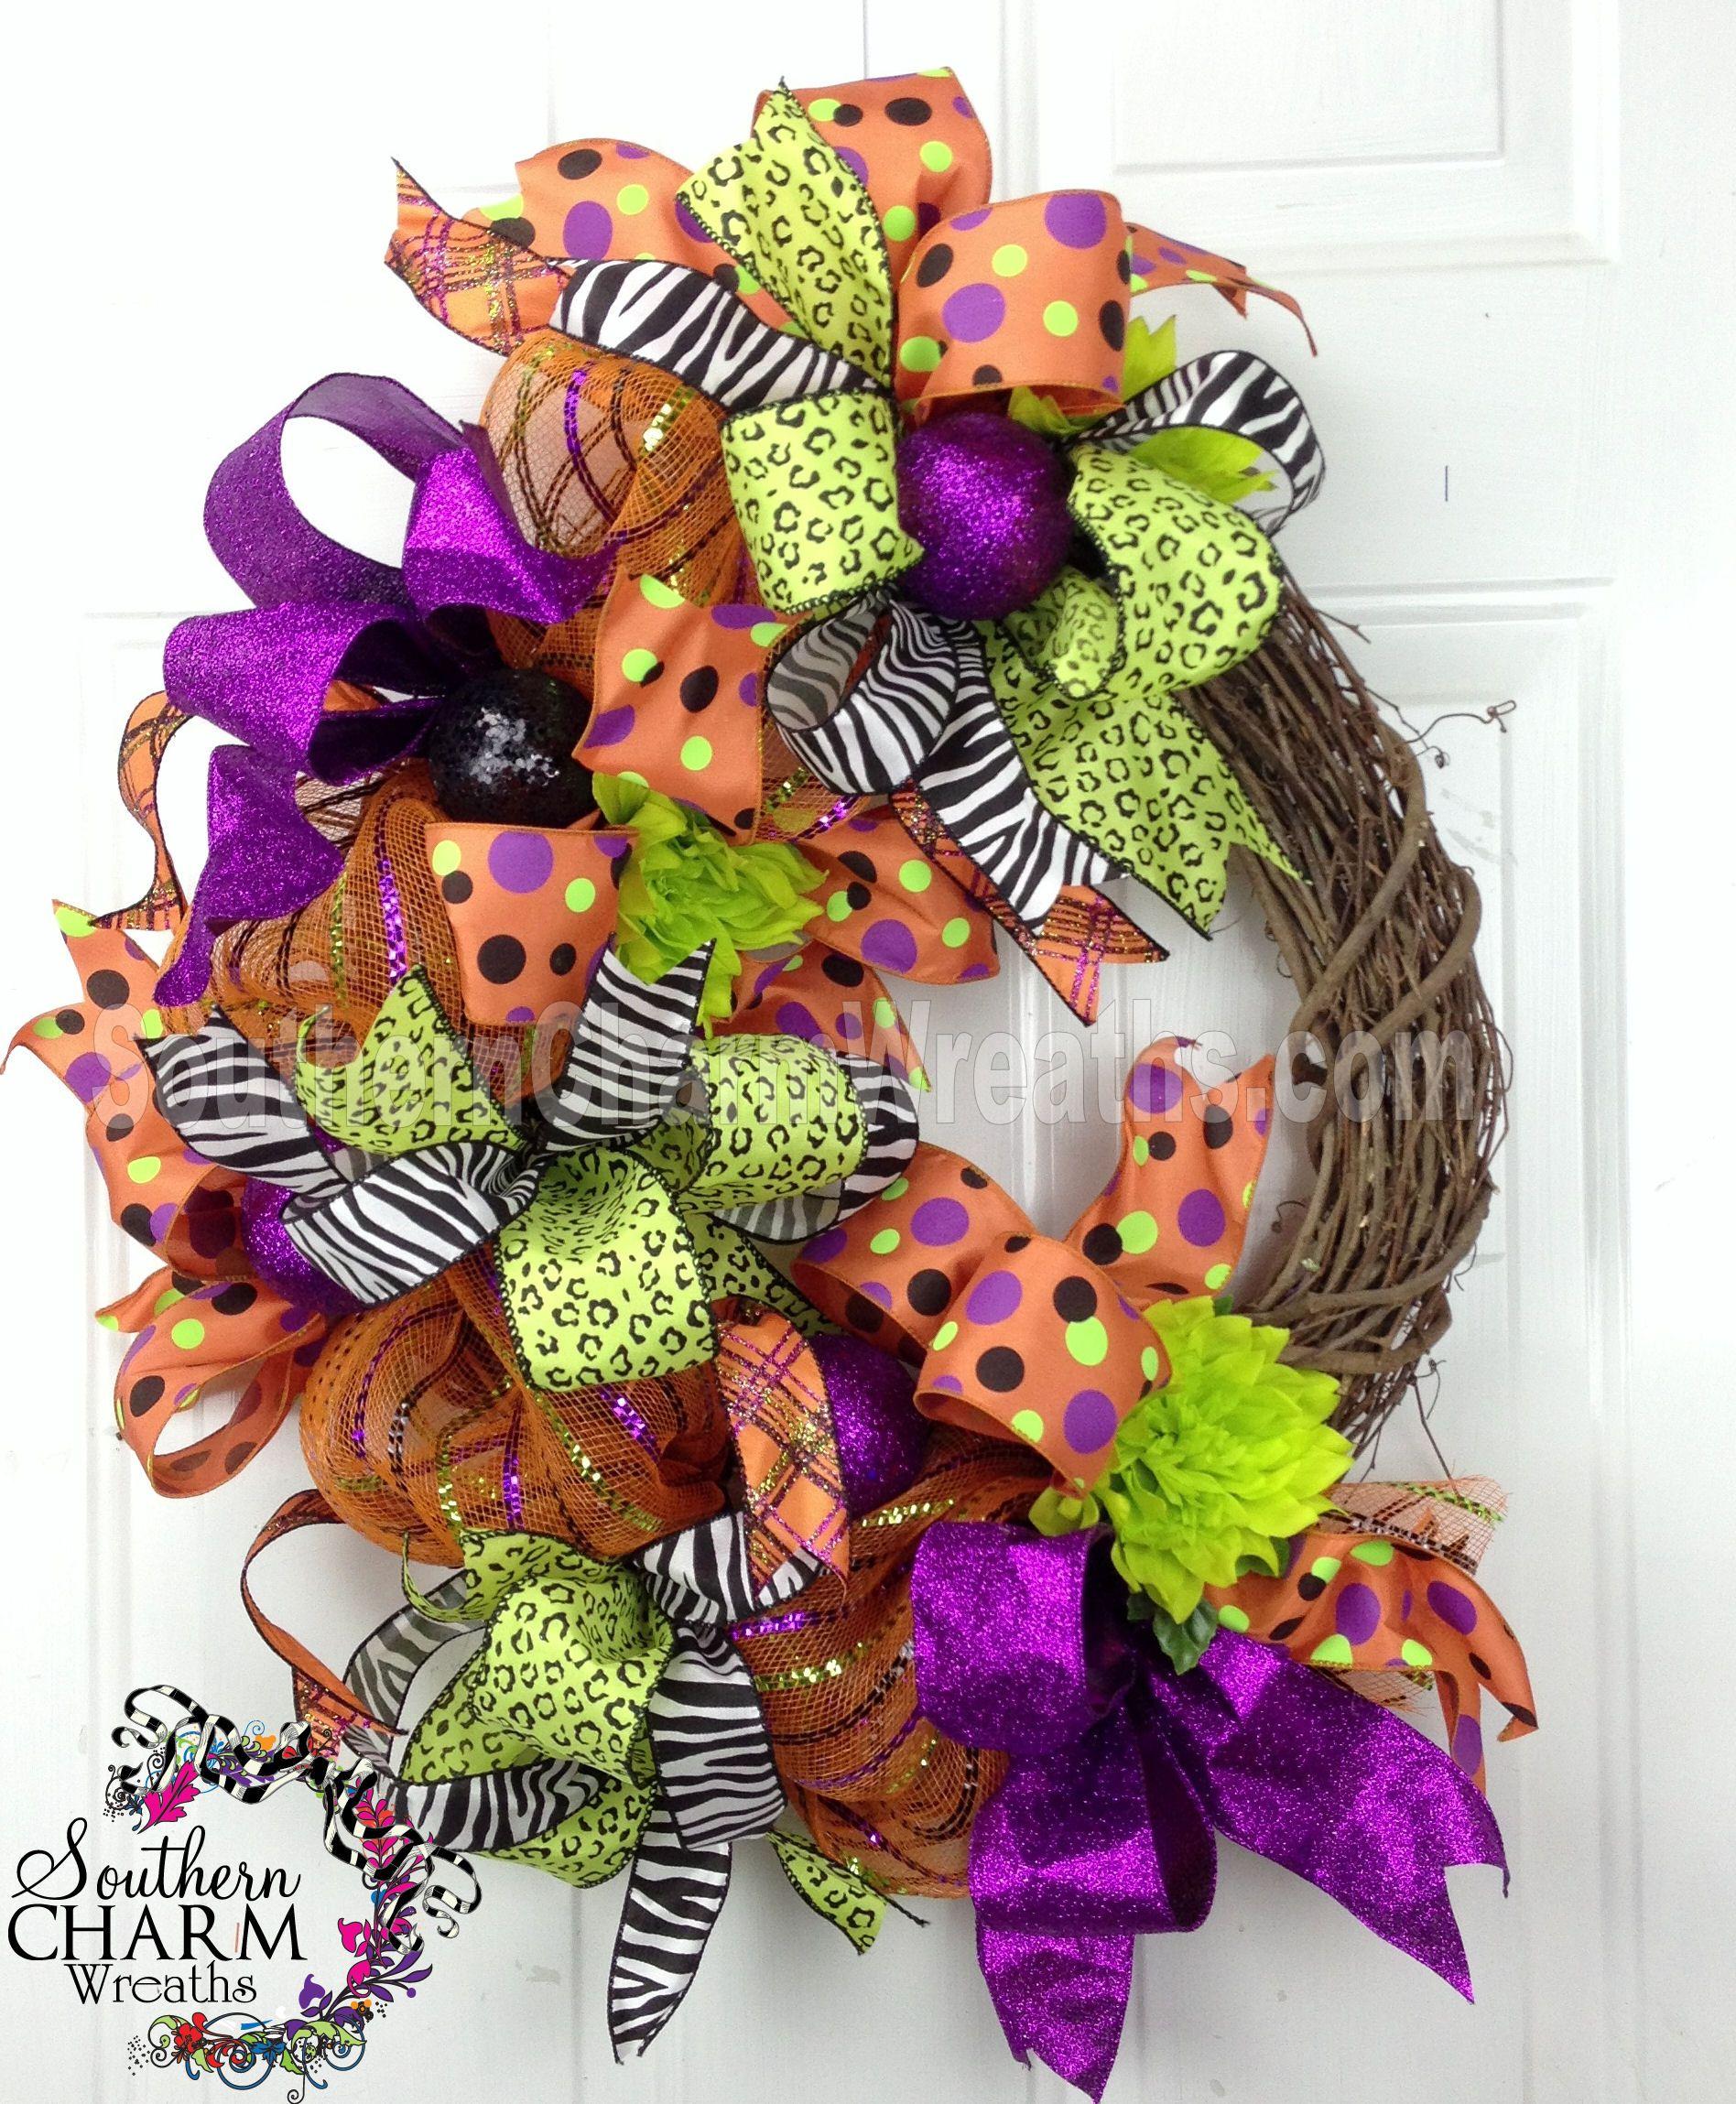 Deco Mesh Wreath Forms -